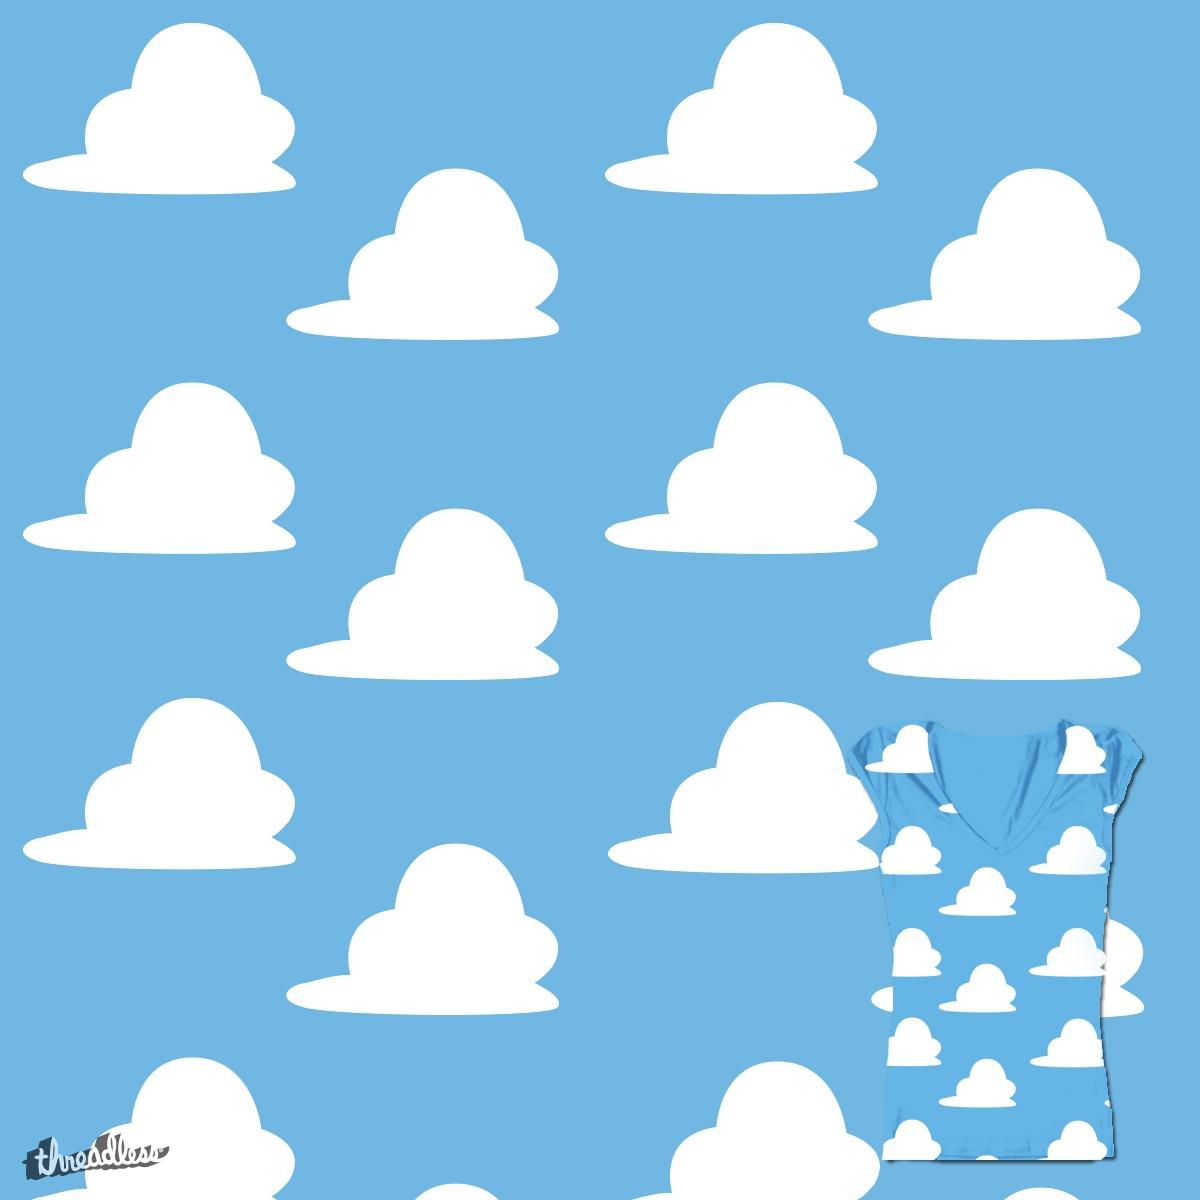 Cloudy Sky by Calironia on Threadless